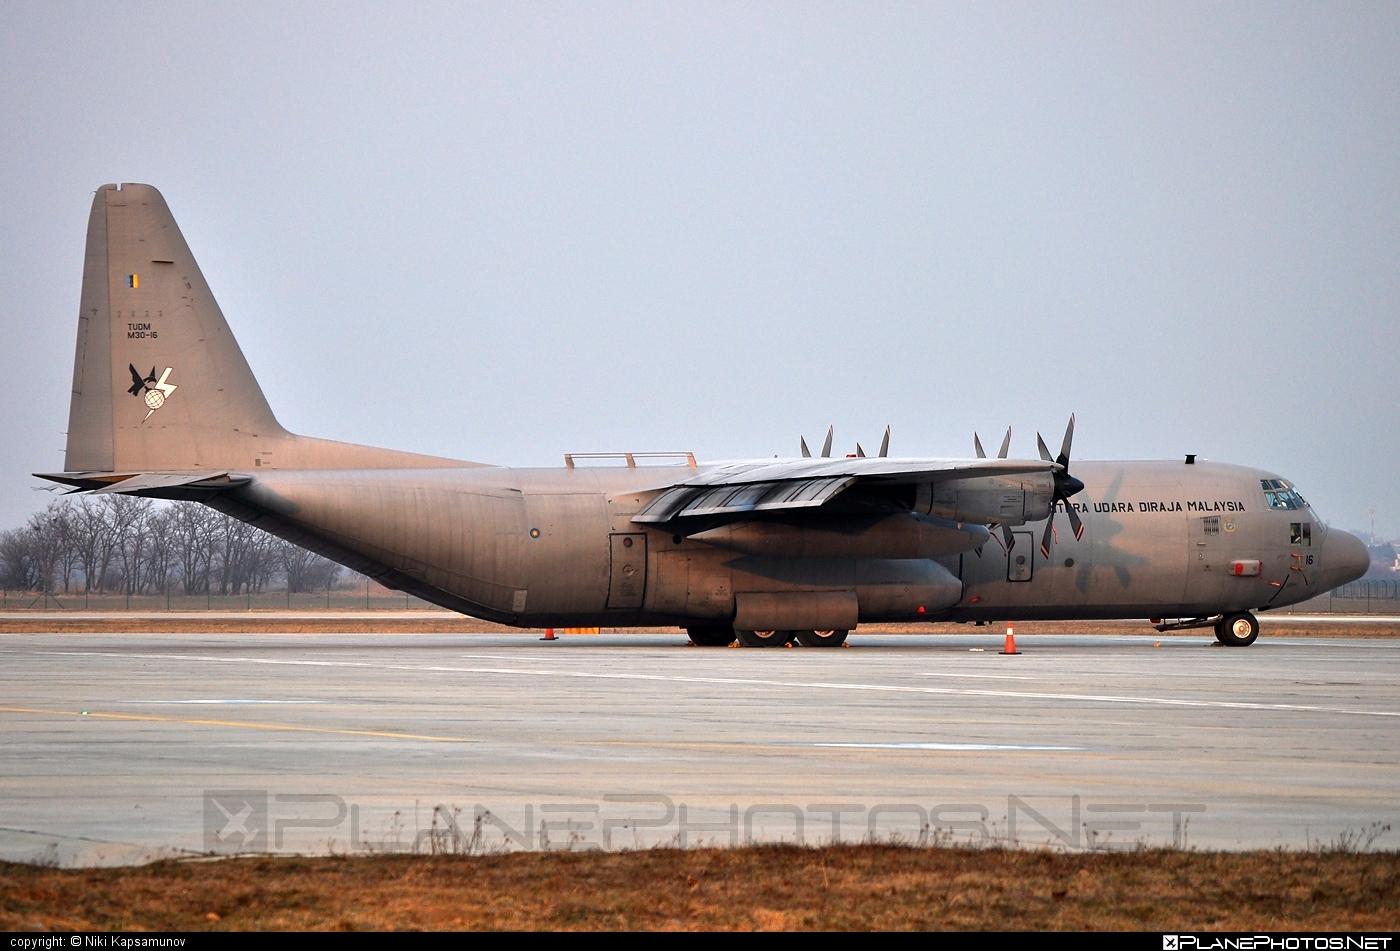 Lockheed C-130H-30 Hercules - M30-16 operated by Tentera Udara Diraja Malaysia (Royal Malaysian Air Force) #lockheed